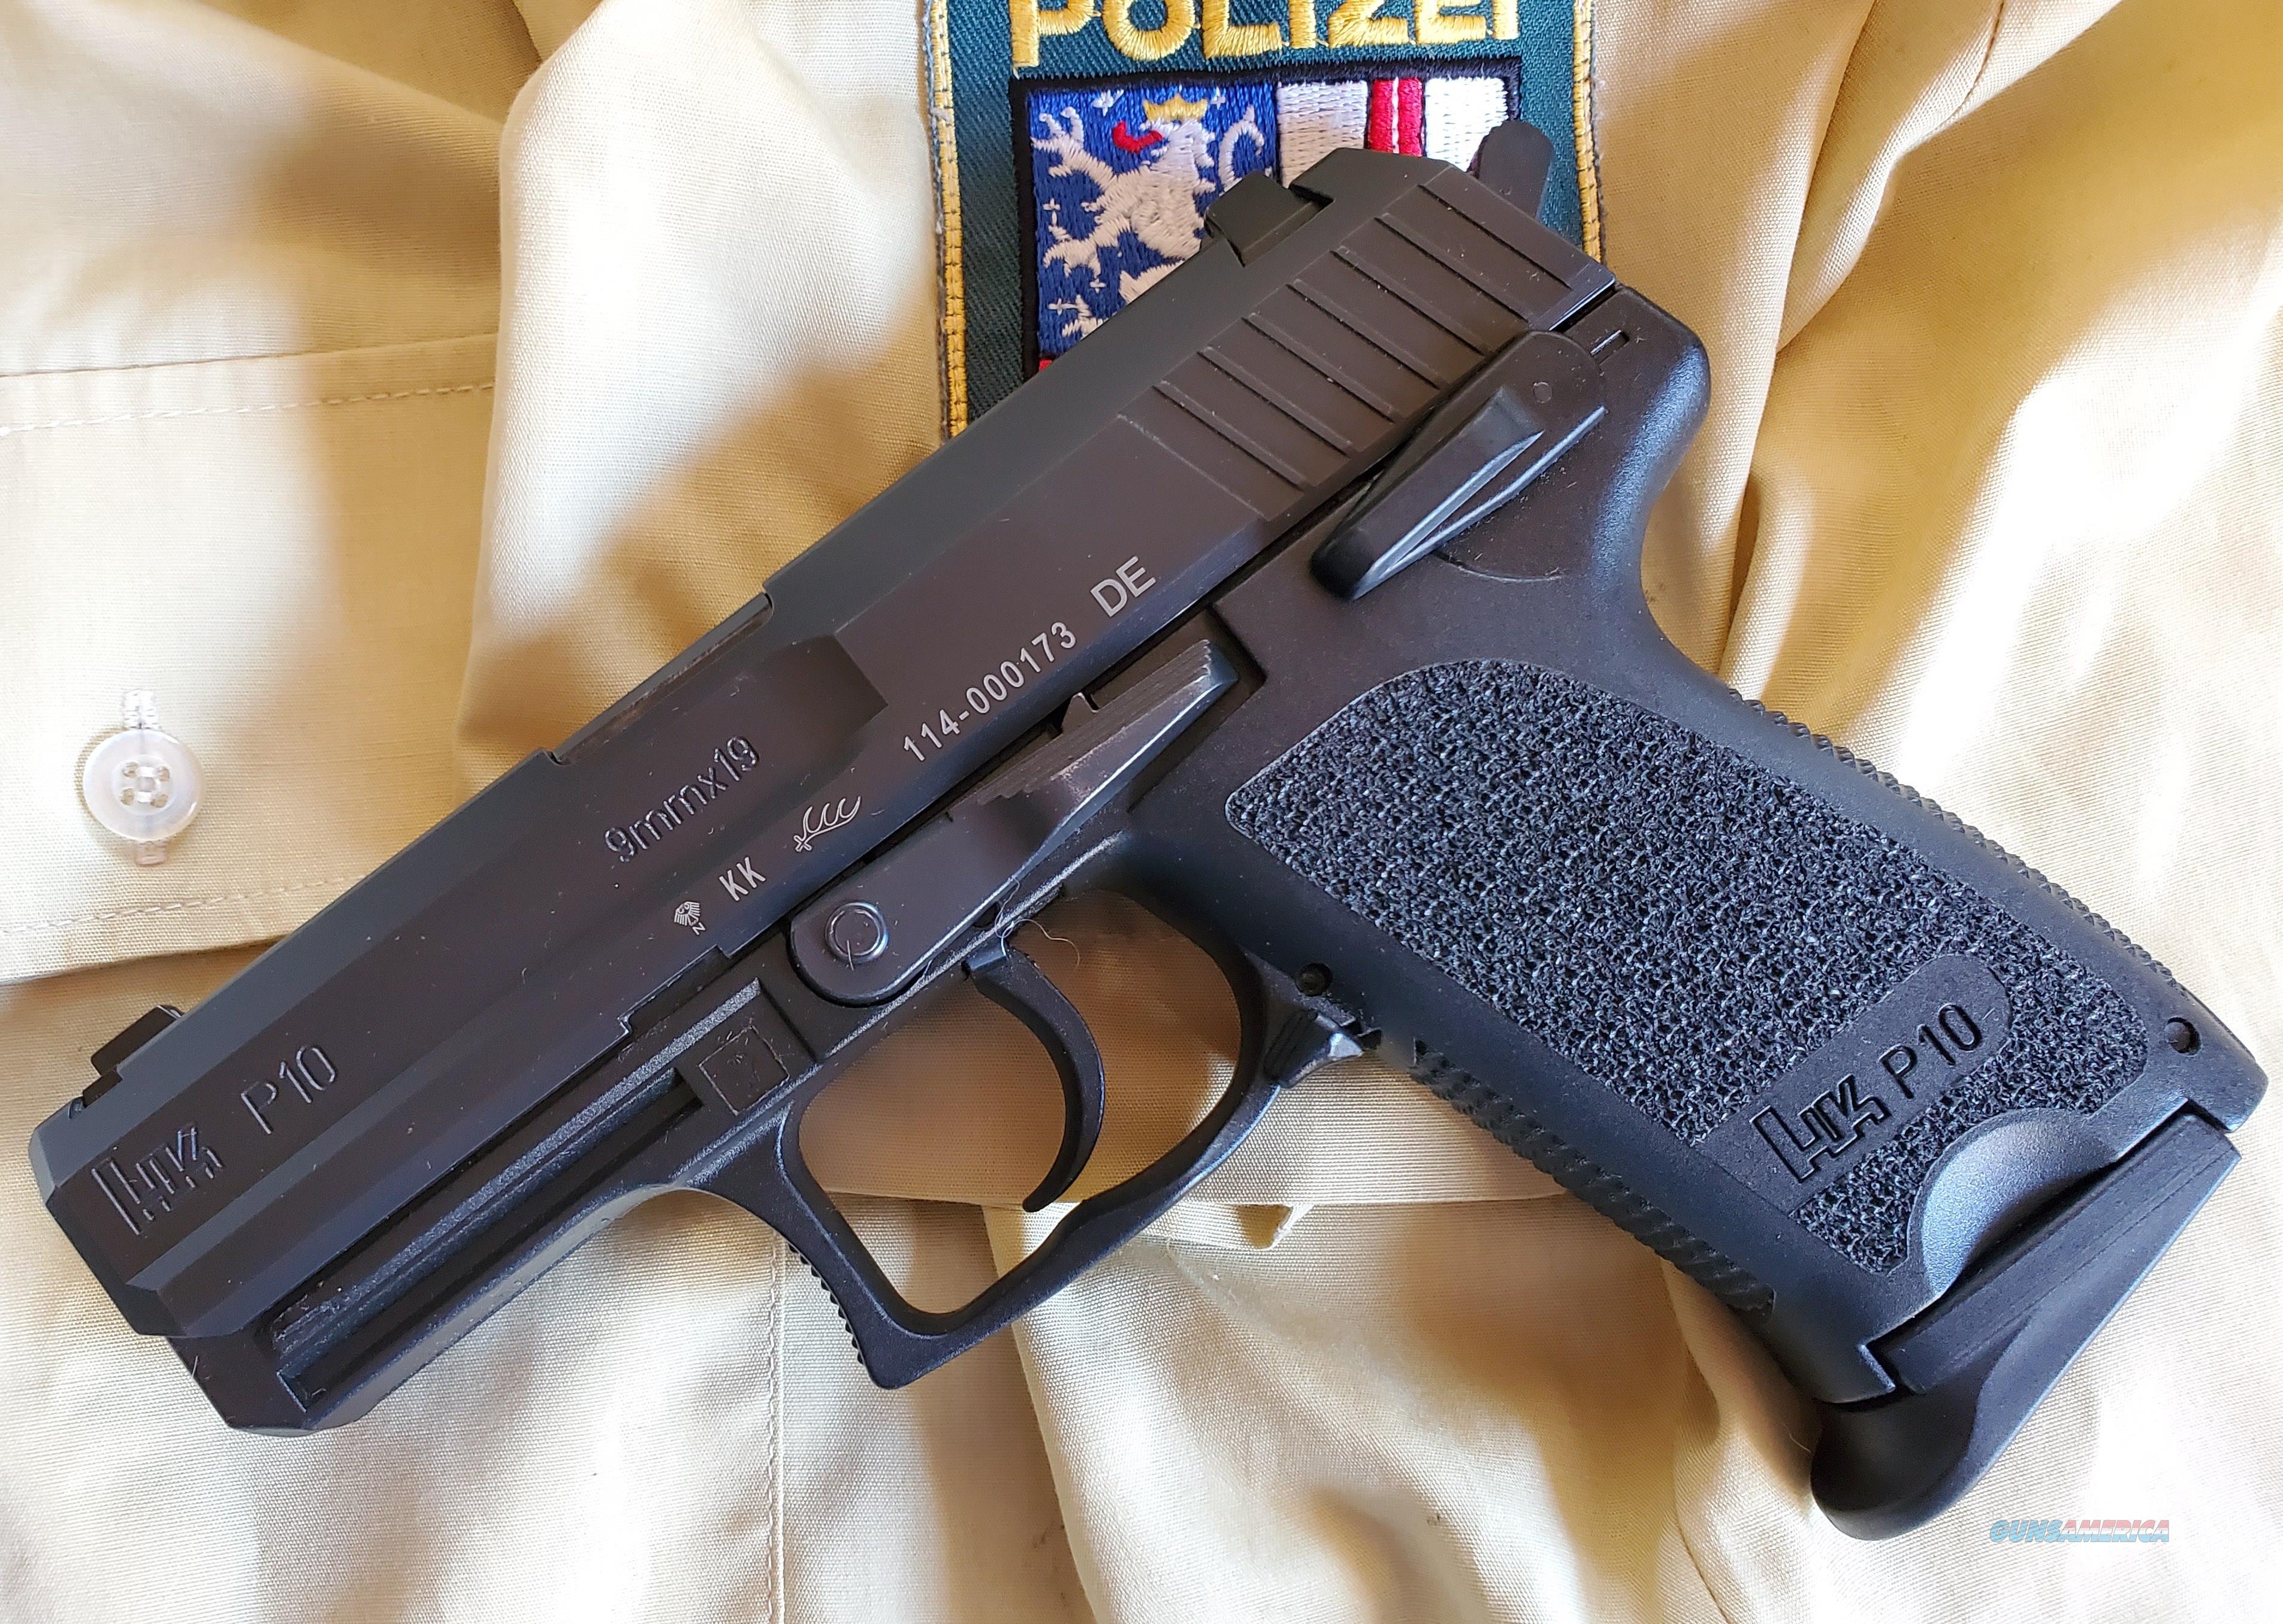 HK P10 Polizei Pistol  Guns > Pistols > Heckler & Koch Pistols > Polymer Frame